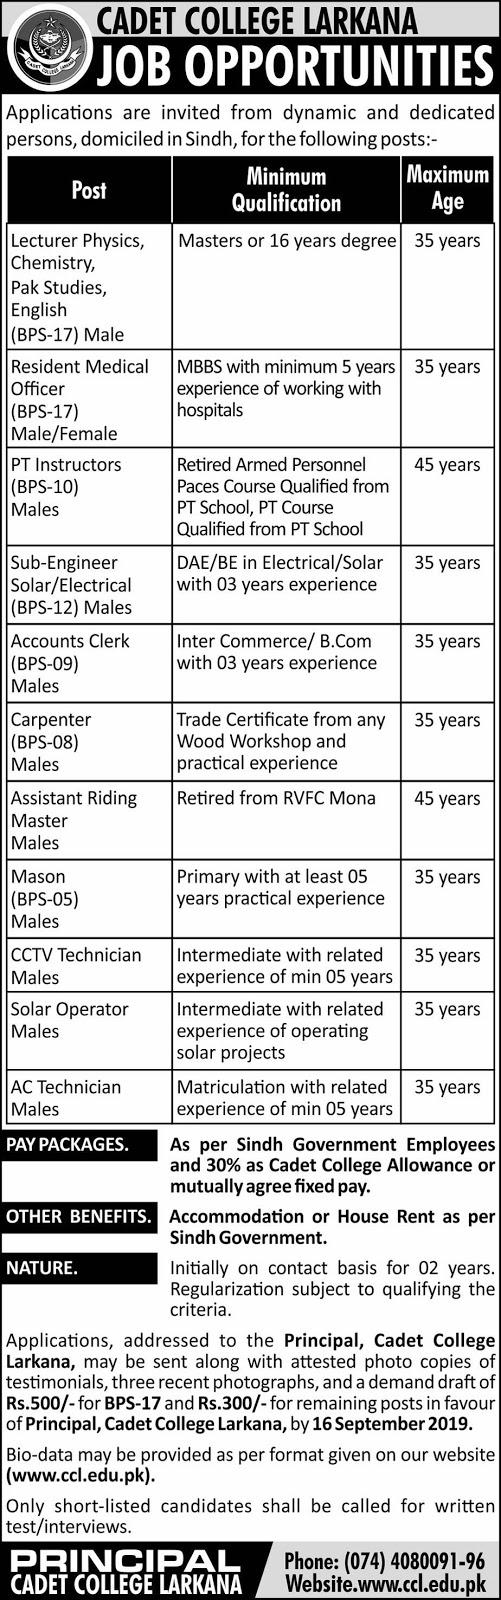 Cadet College Larkana Jobs August 2019 for Sub-Engineer.